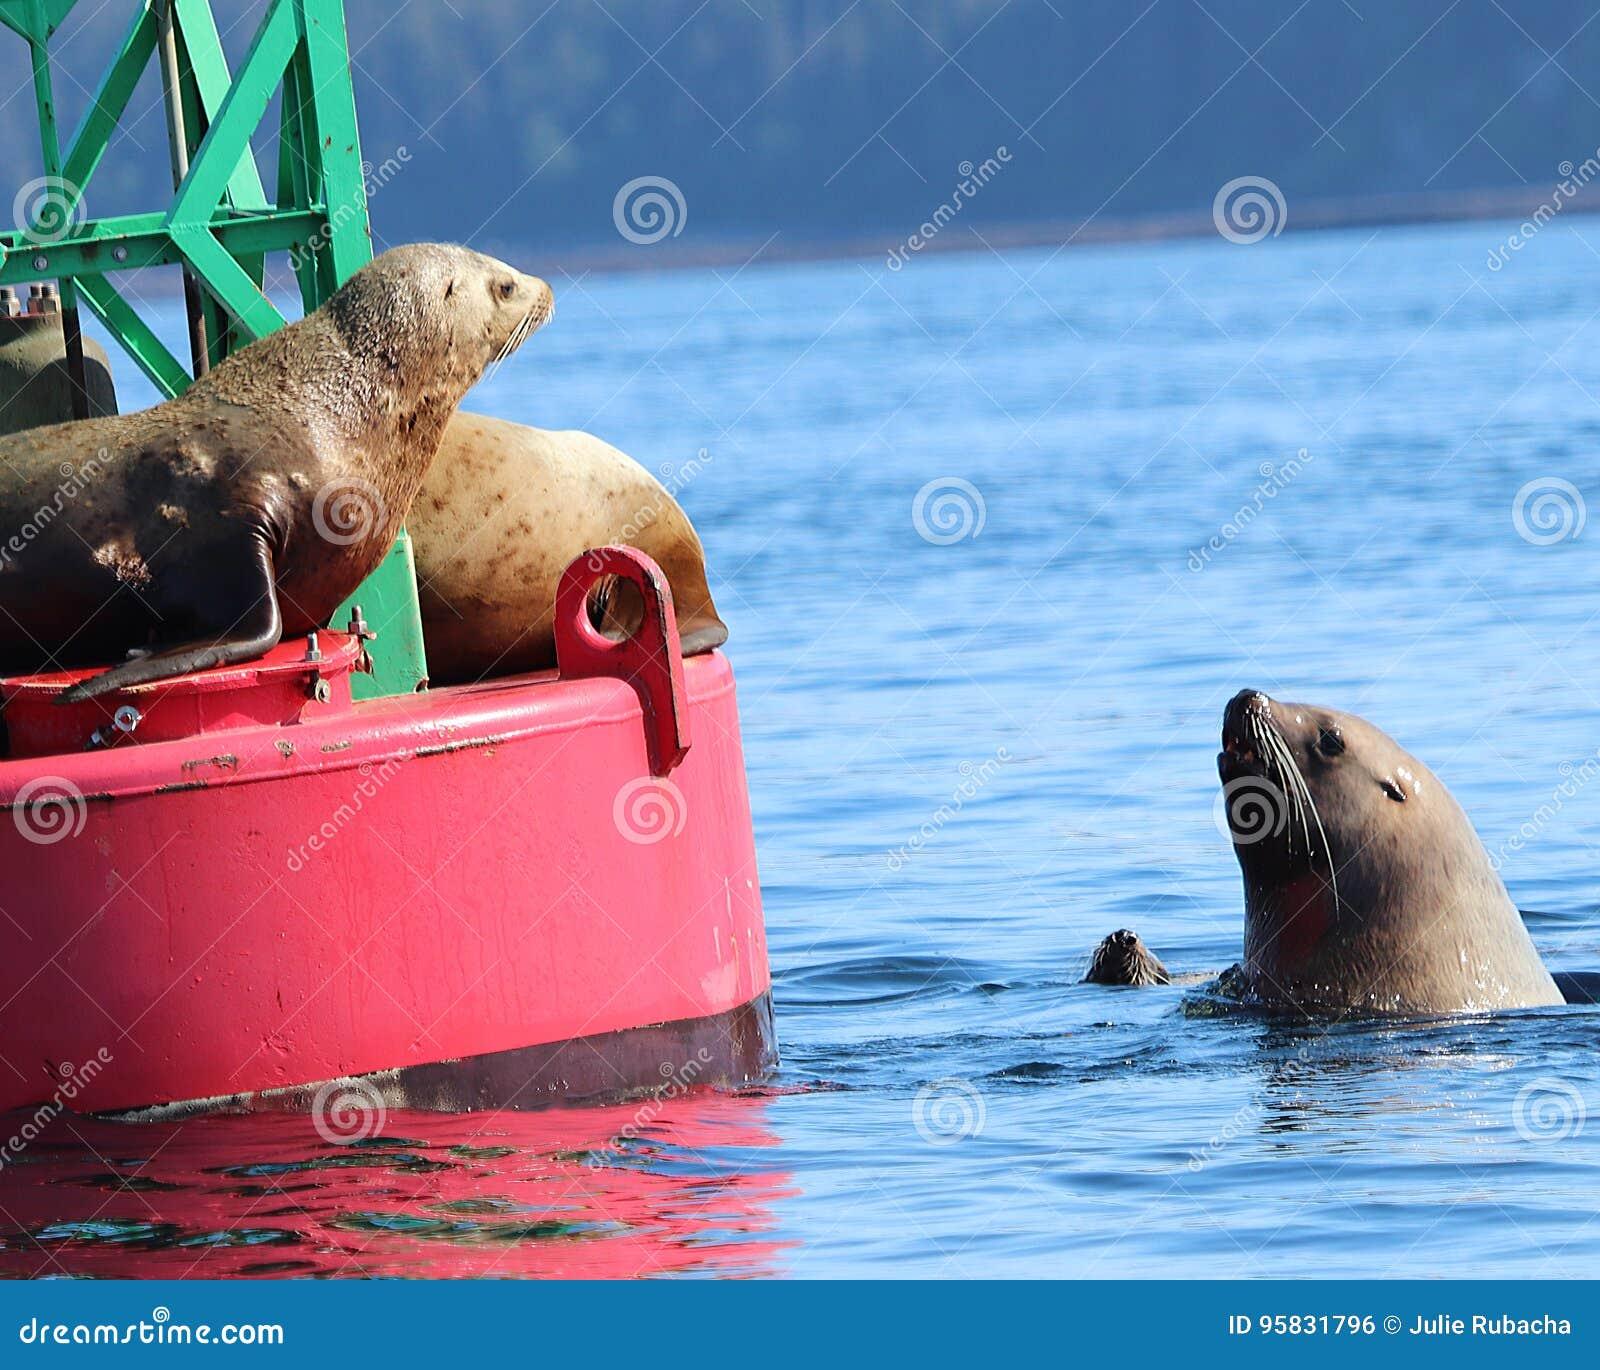 Stellar Sea Lions fighting over buoy